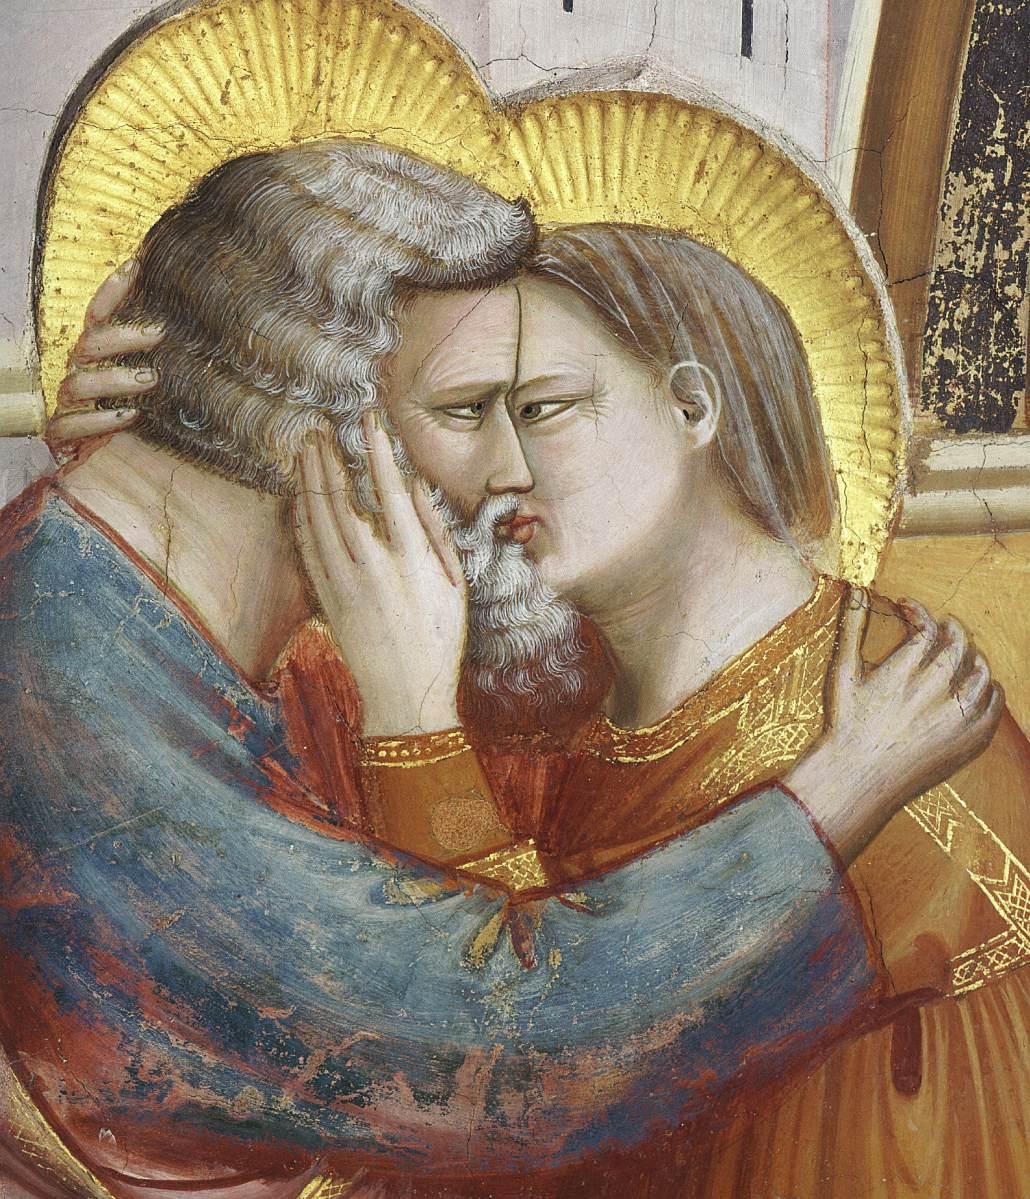 Giotto di Bondone, De ontmoeting bij de Gouden Poort (detail)a, Fresco, Cappella Scrovegni (Arenakapel), Padua